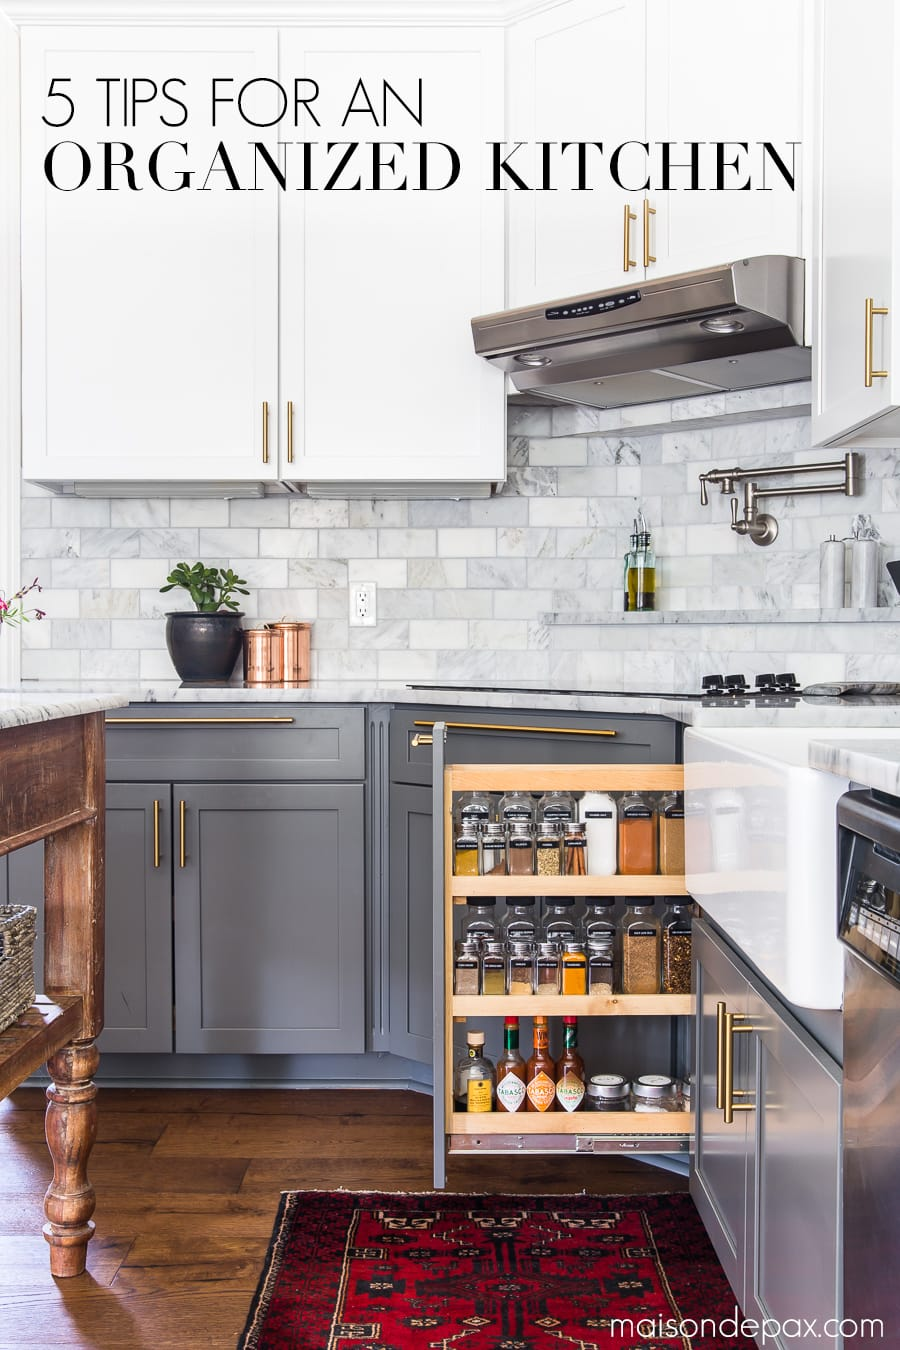 Follow these 5 kitchen organizing ideas for a beautiful AND functional kitchen! #kitchenorganization #organizing #kitchendesign